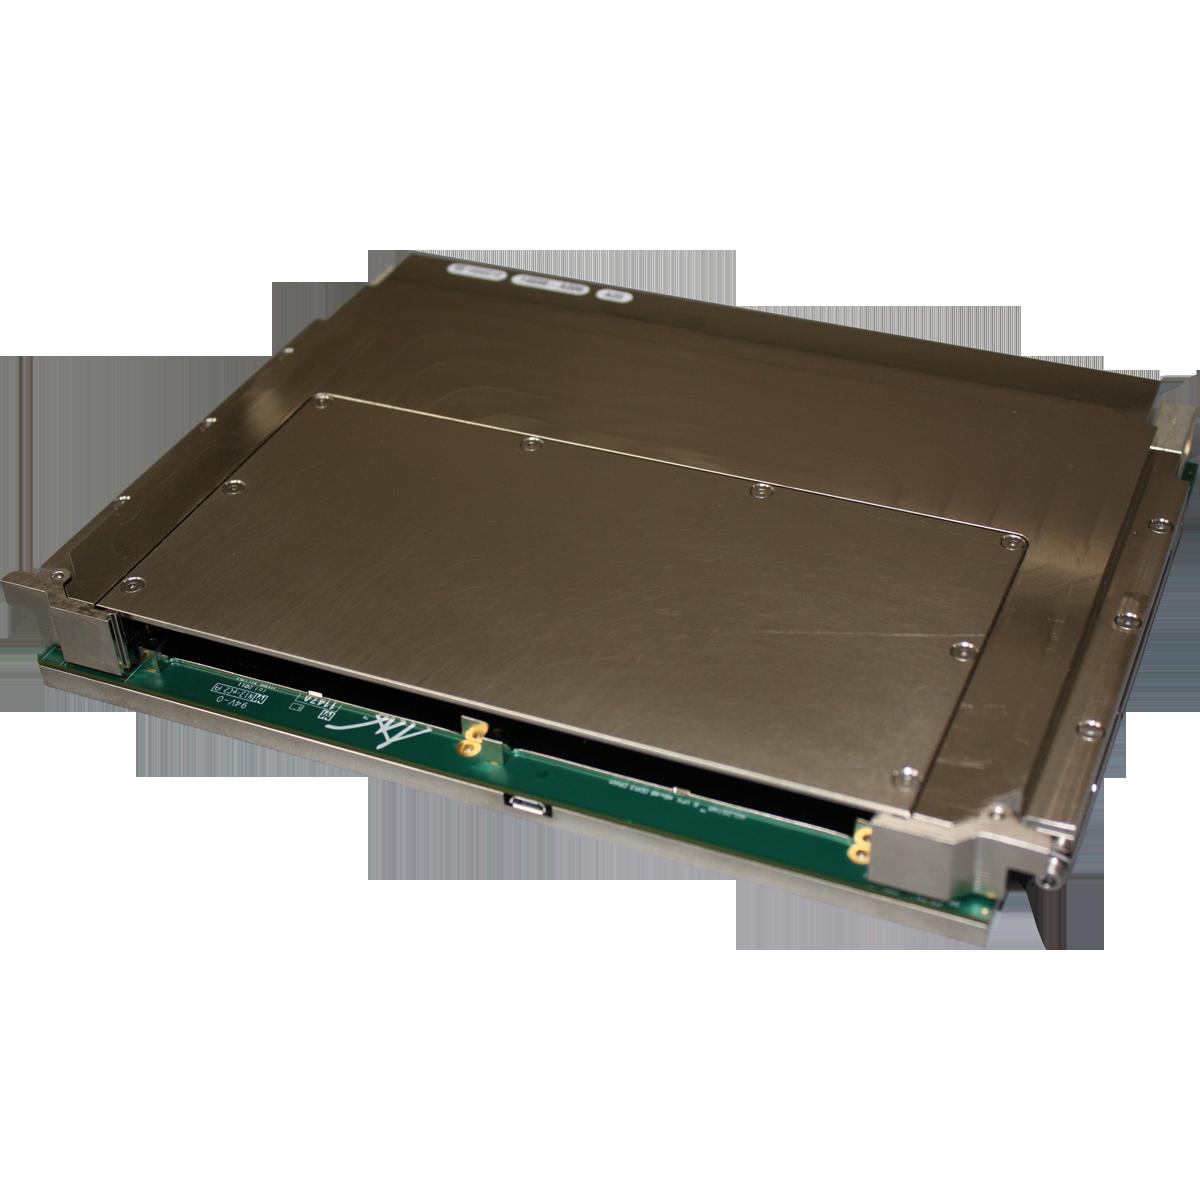 Xilinx Virtex 7 OpenVPX 6U FPGA Conduction-Cooled Board